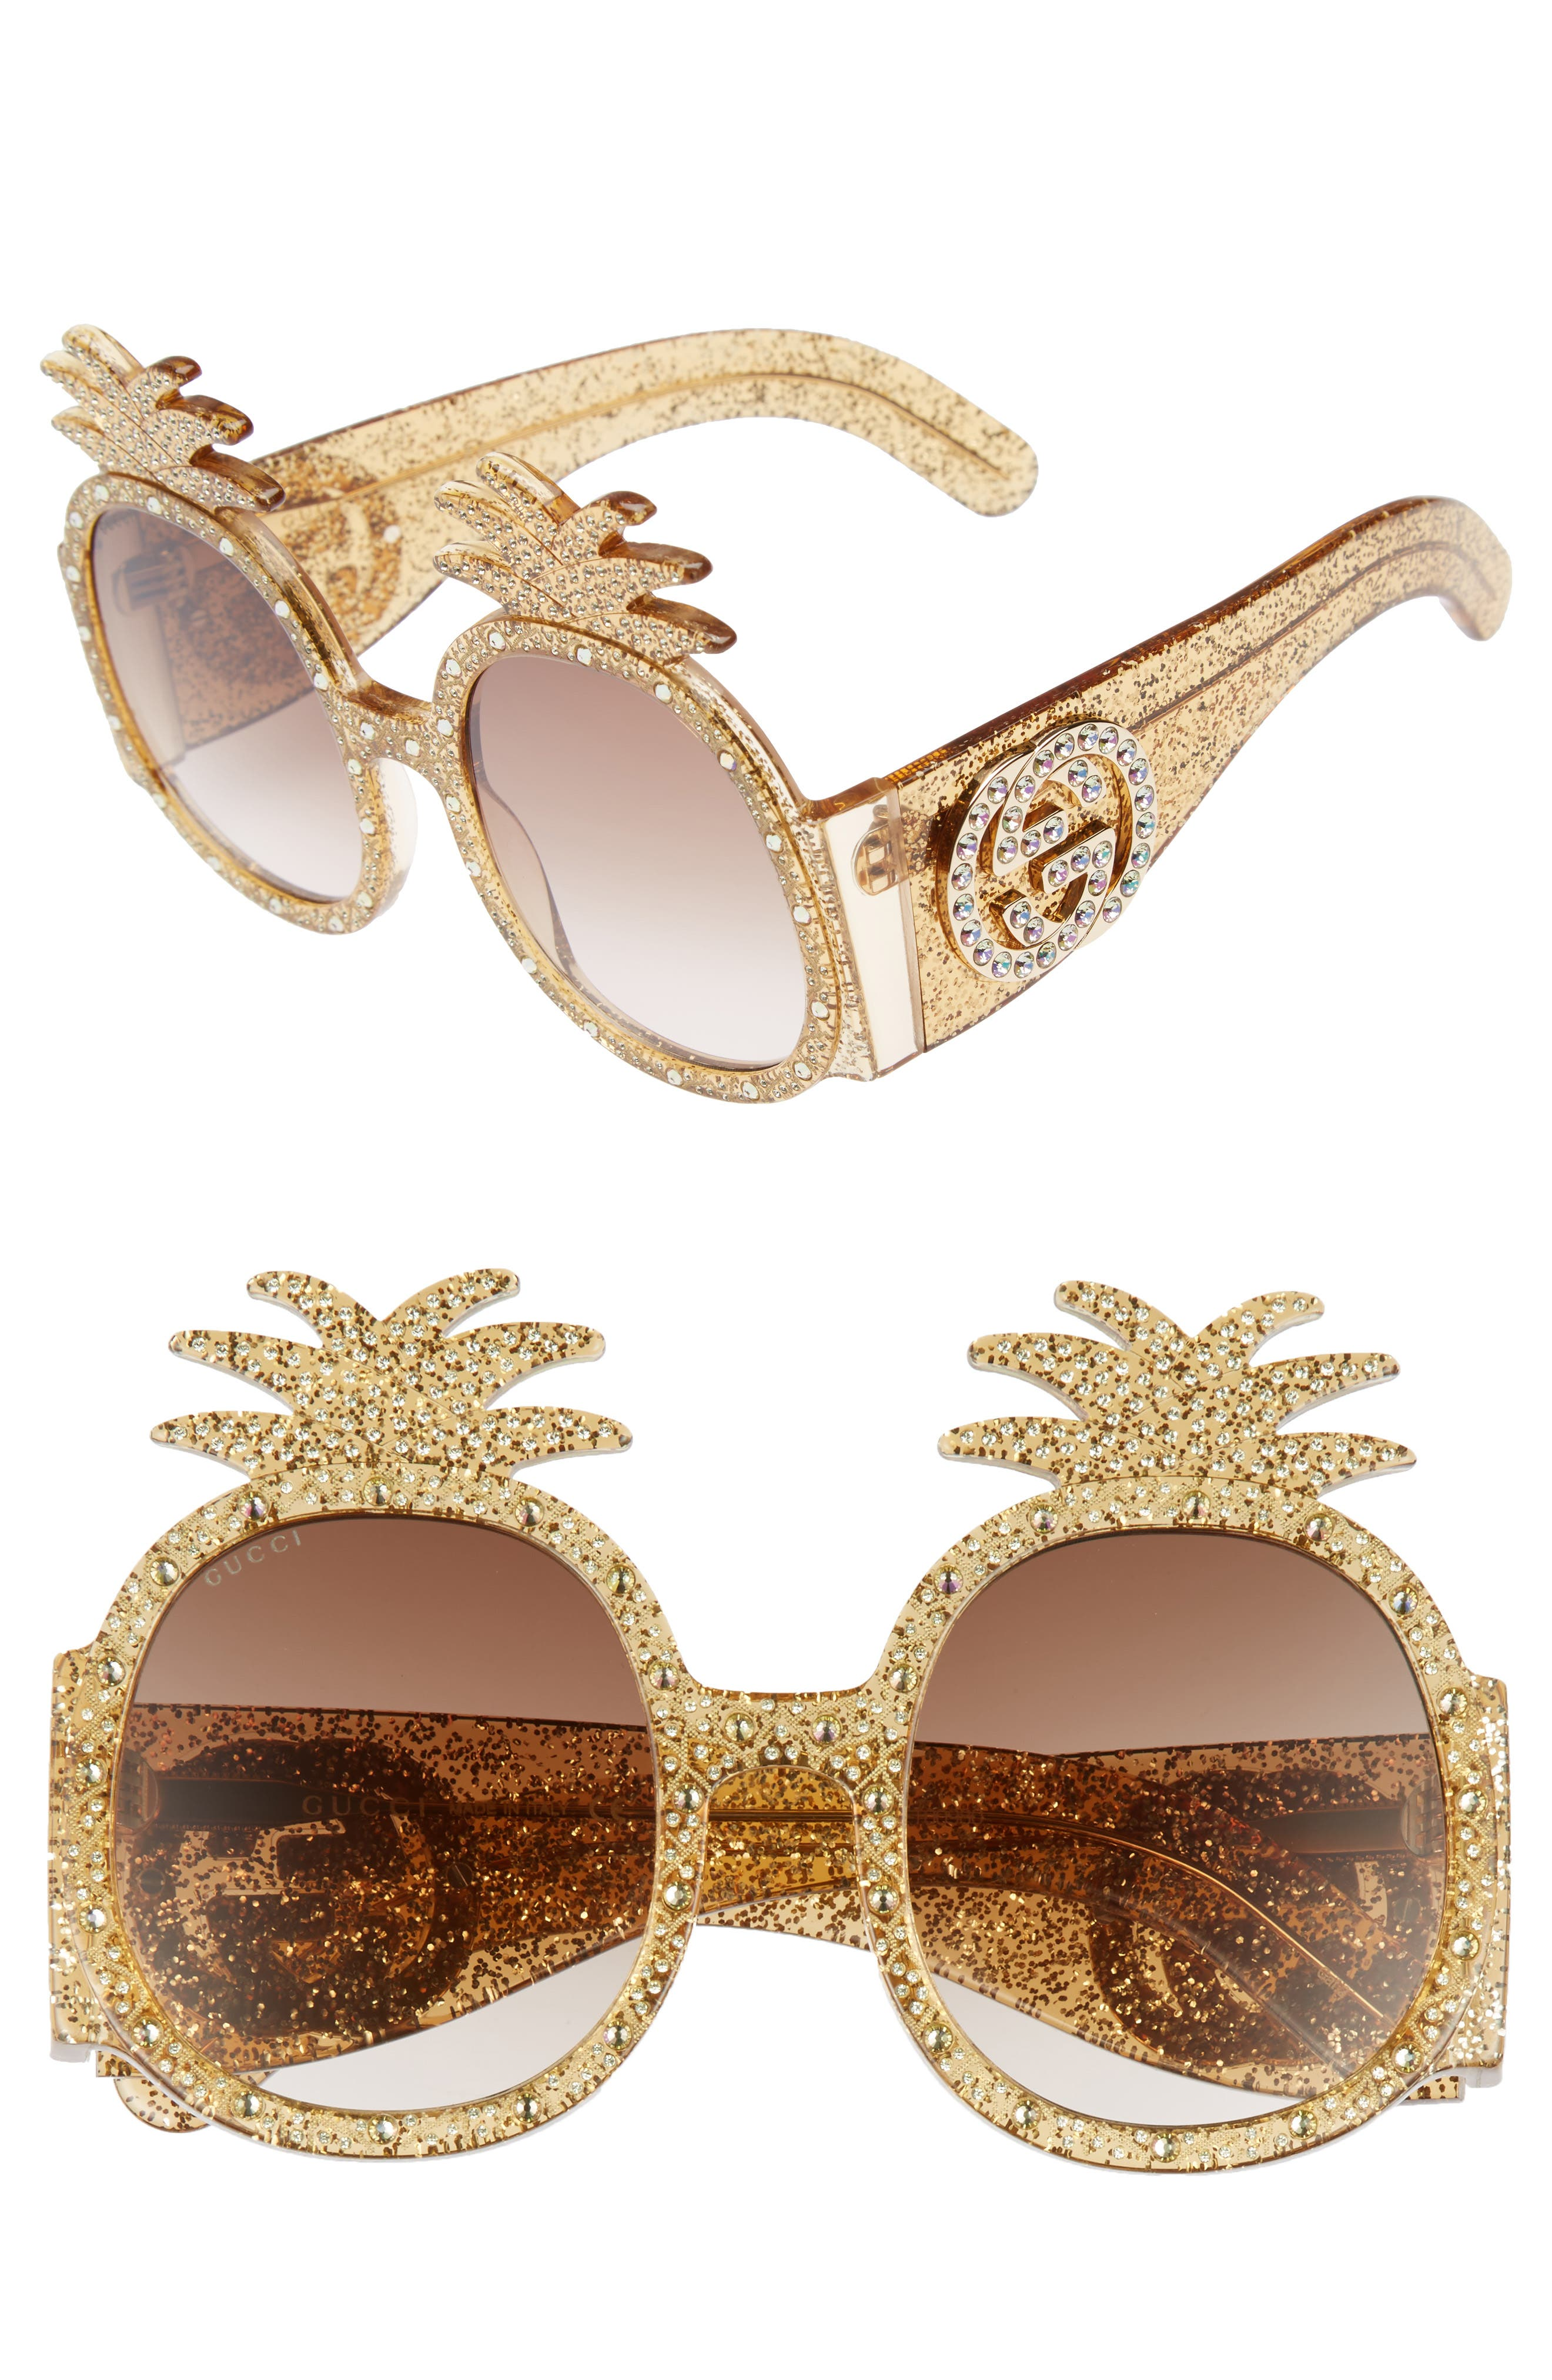 53mm Pineapple Sunglasses,                             Main thumbnail 1, color,                             GOLD